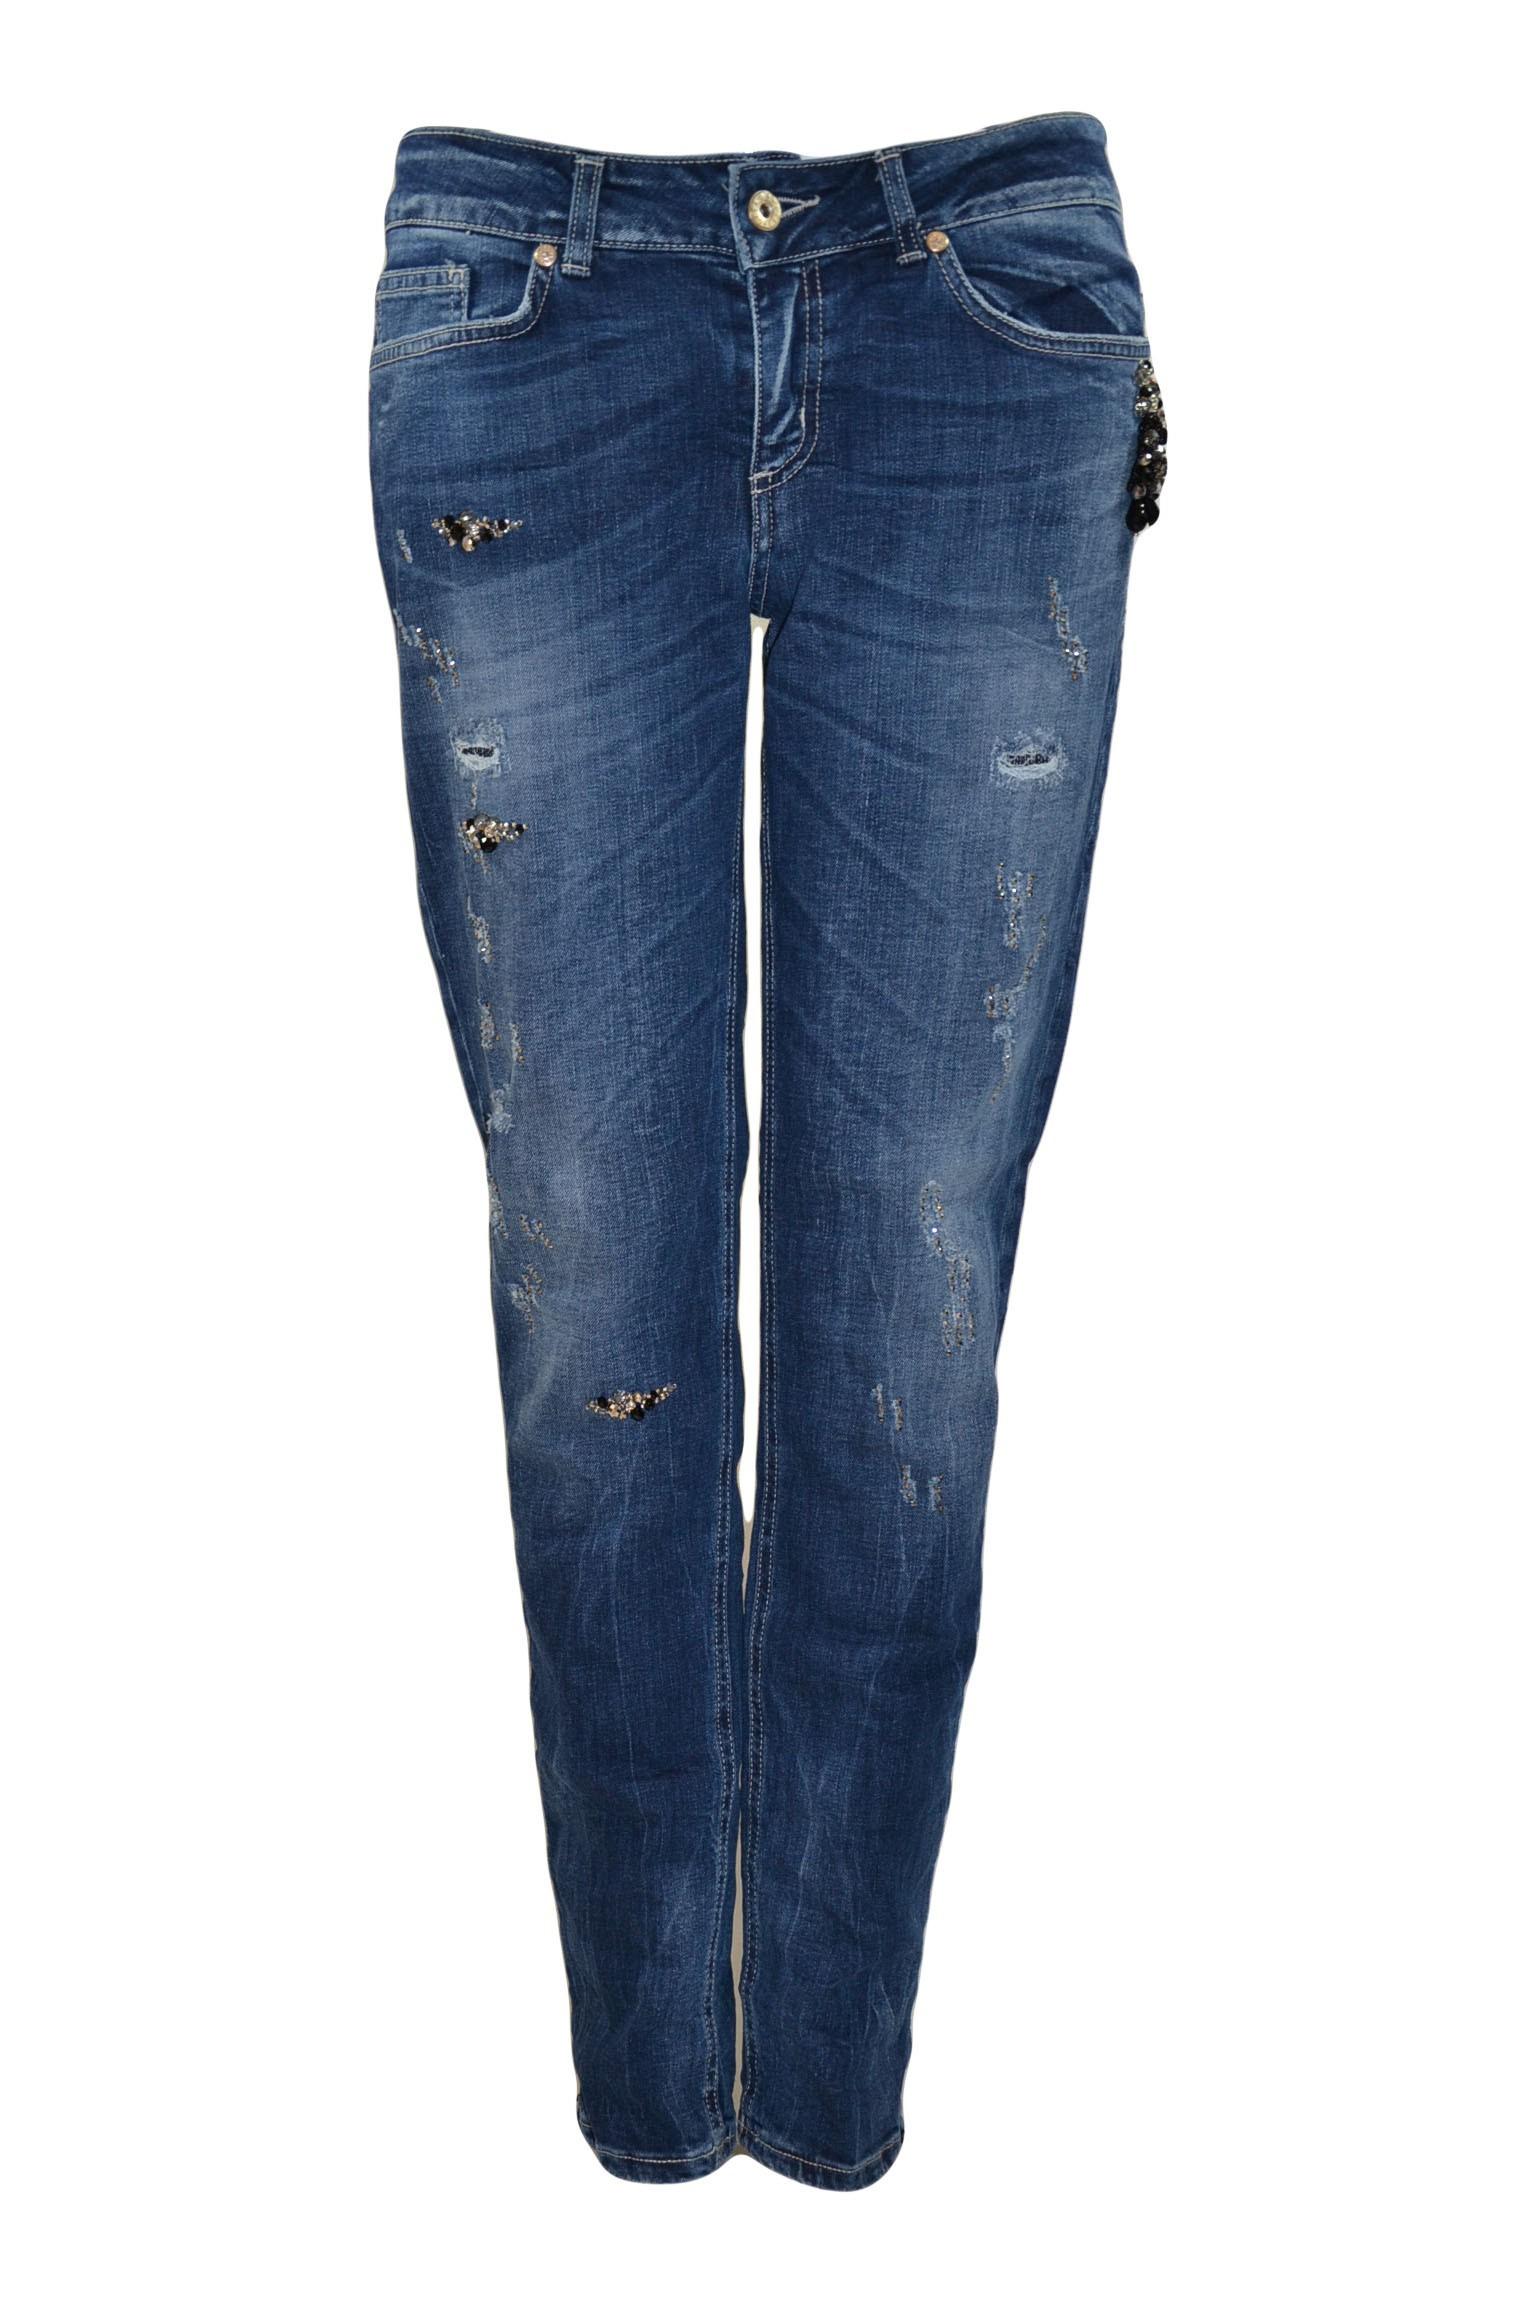 Rossodisera jeans j3096black